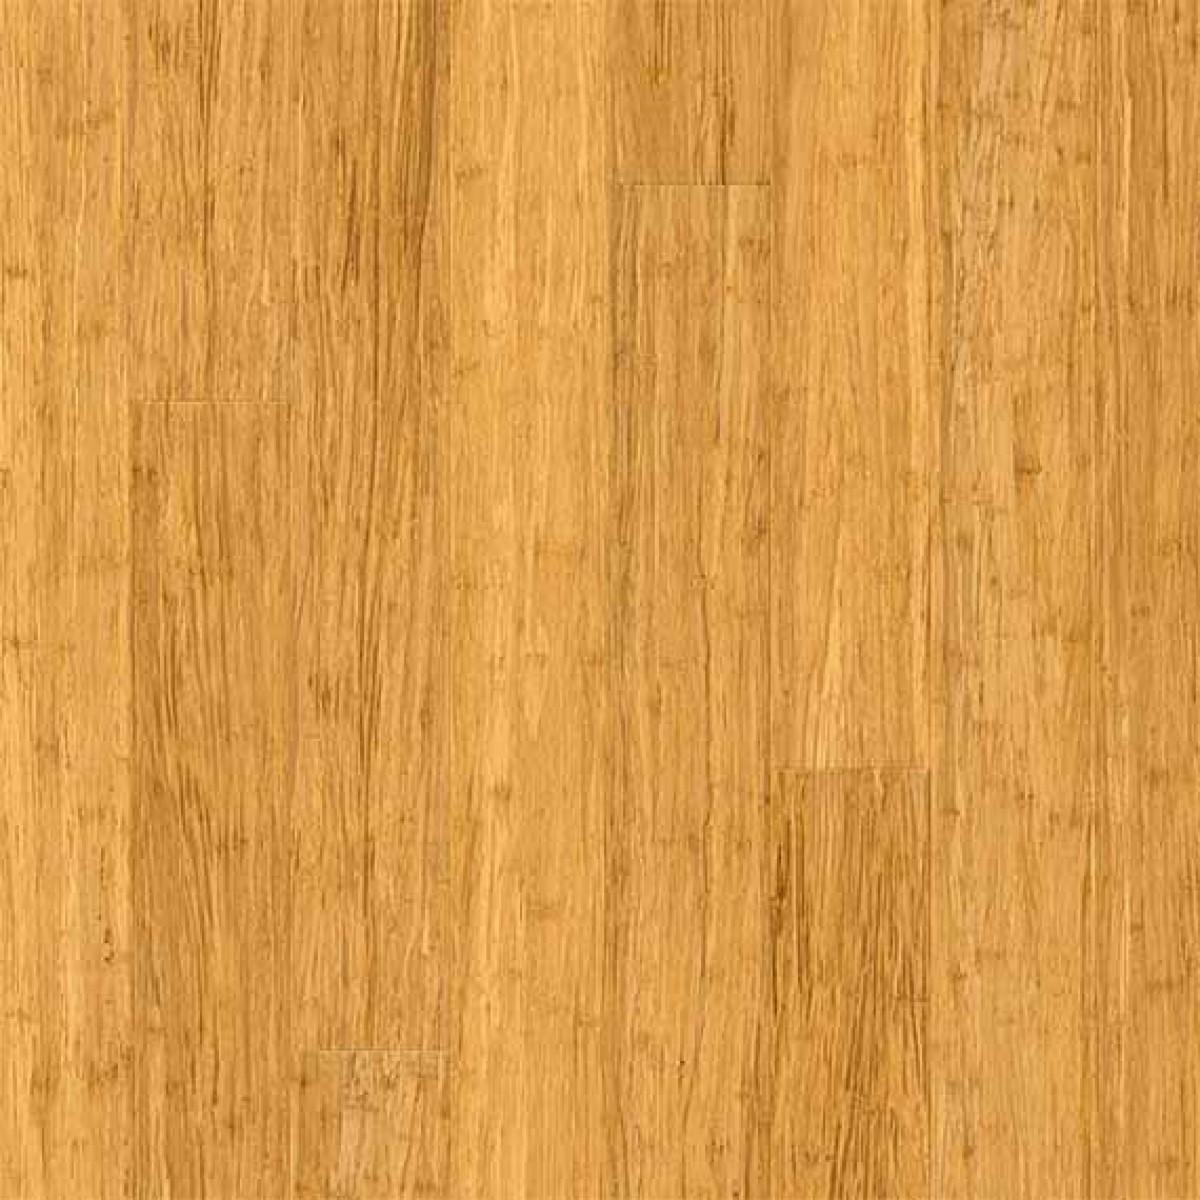 ARC Natural Bamboo